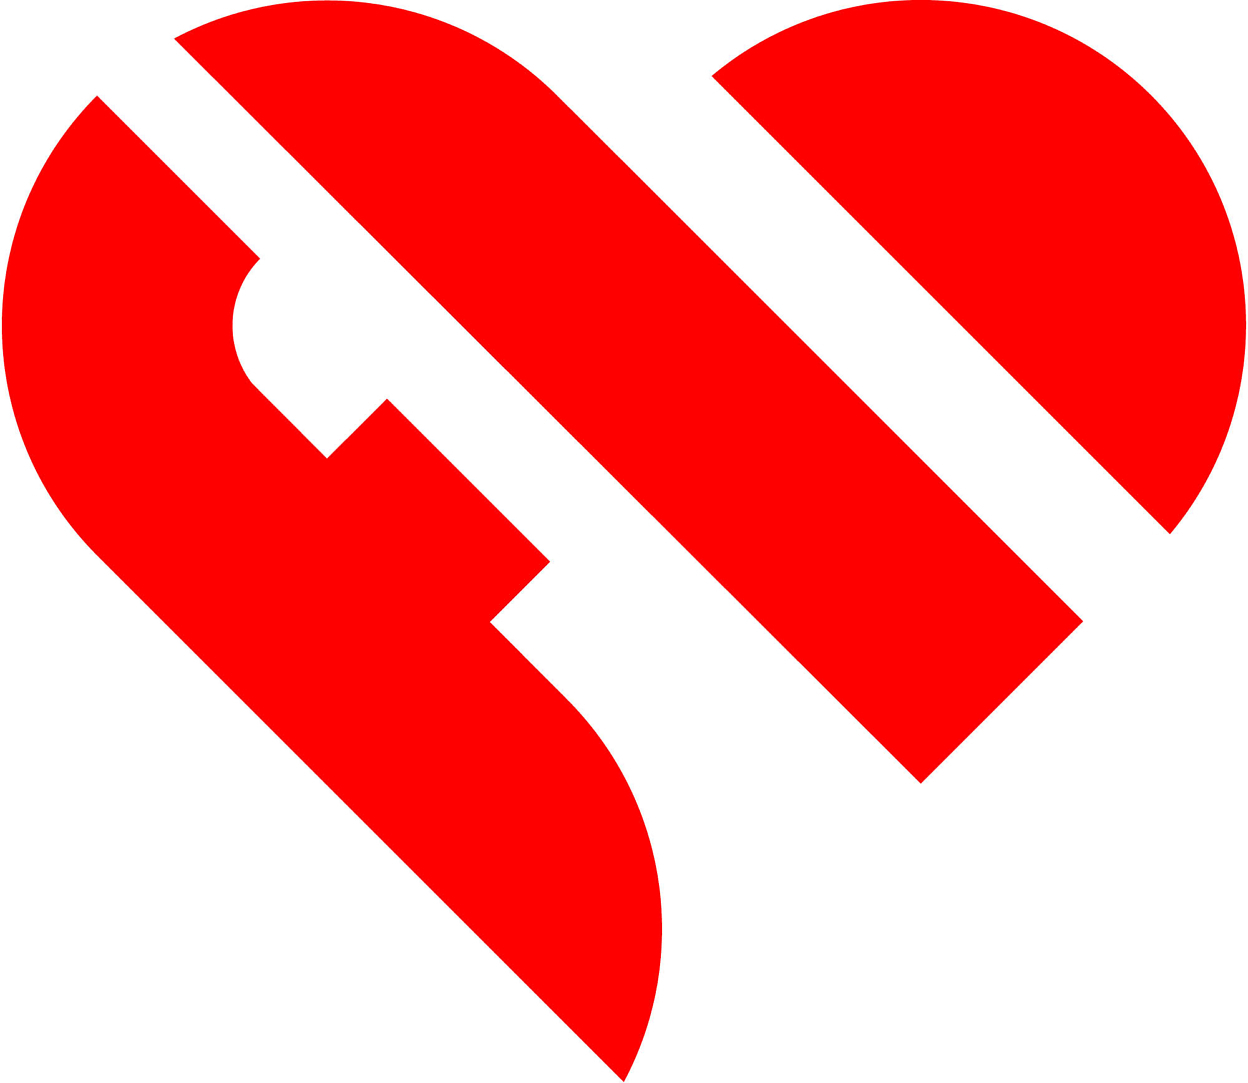 Freeberg - Hubertus Design Hubertus Design